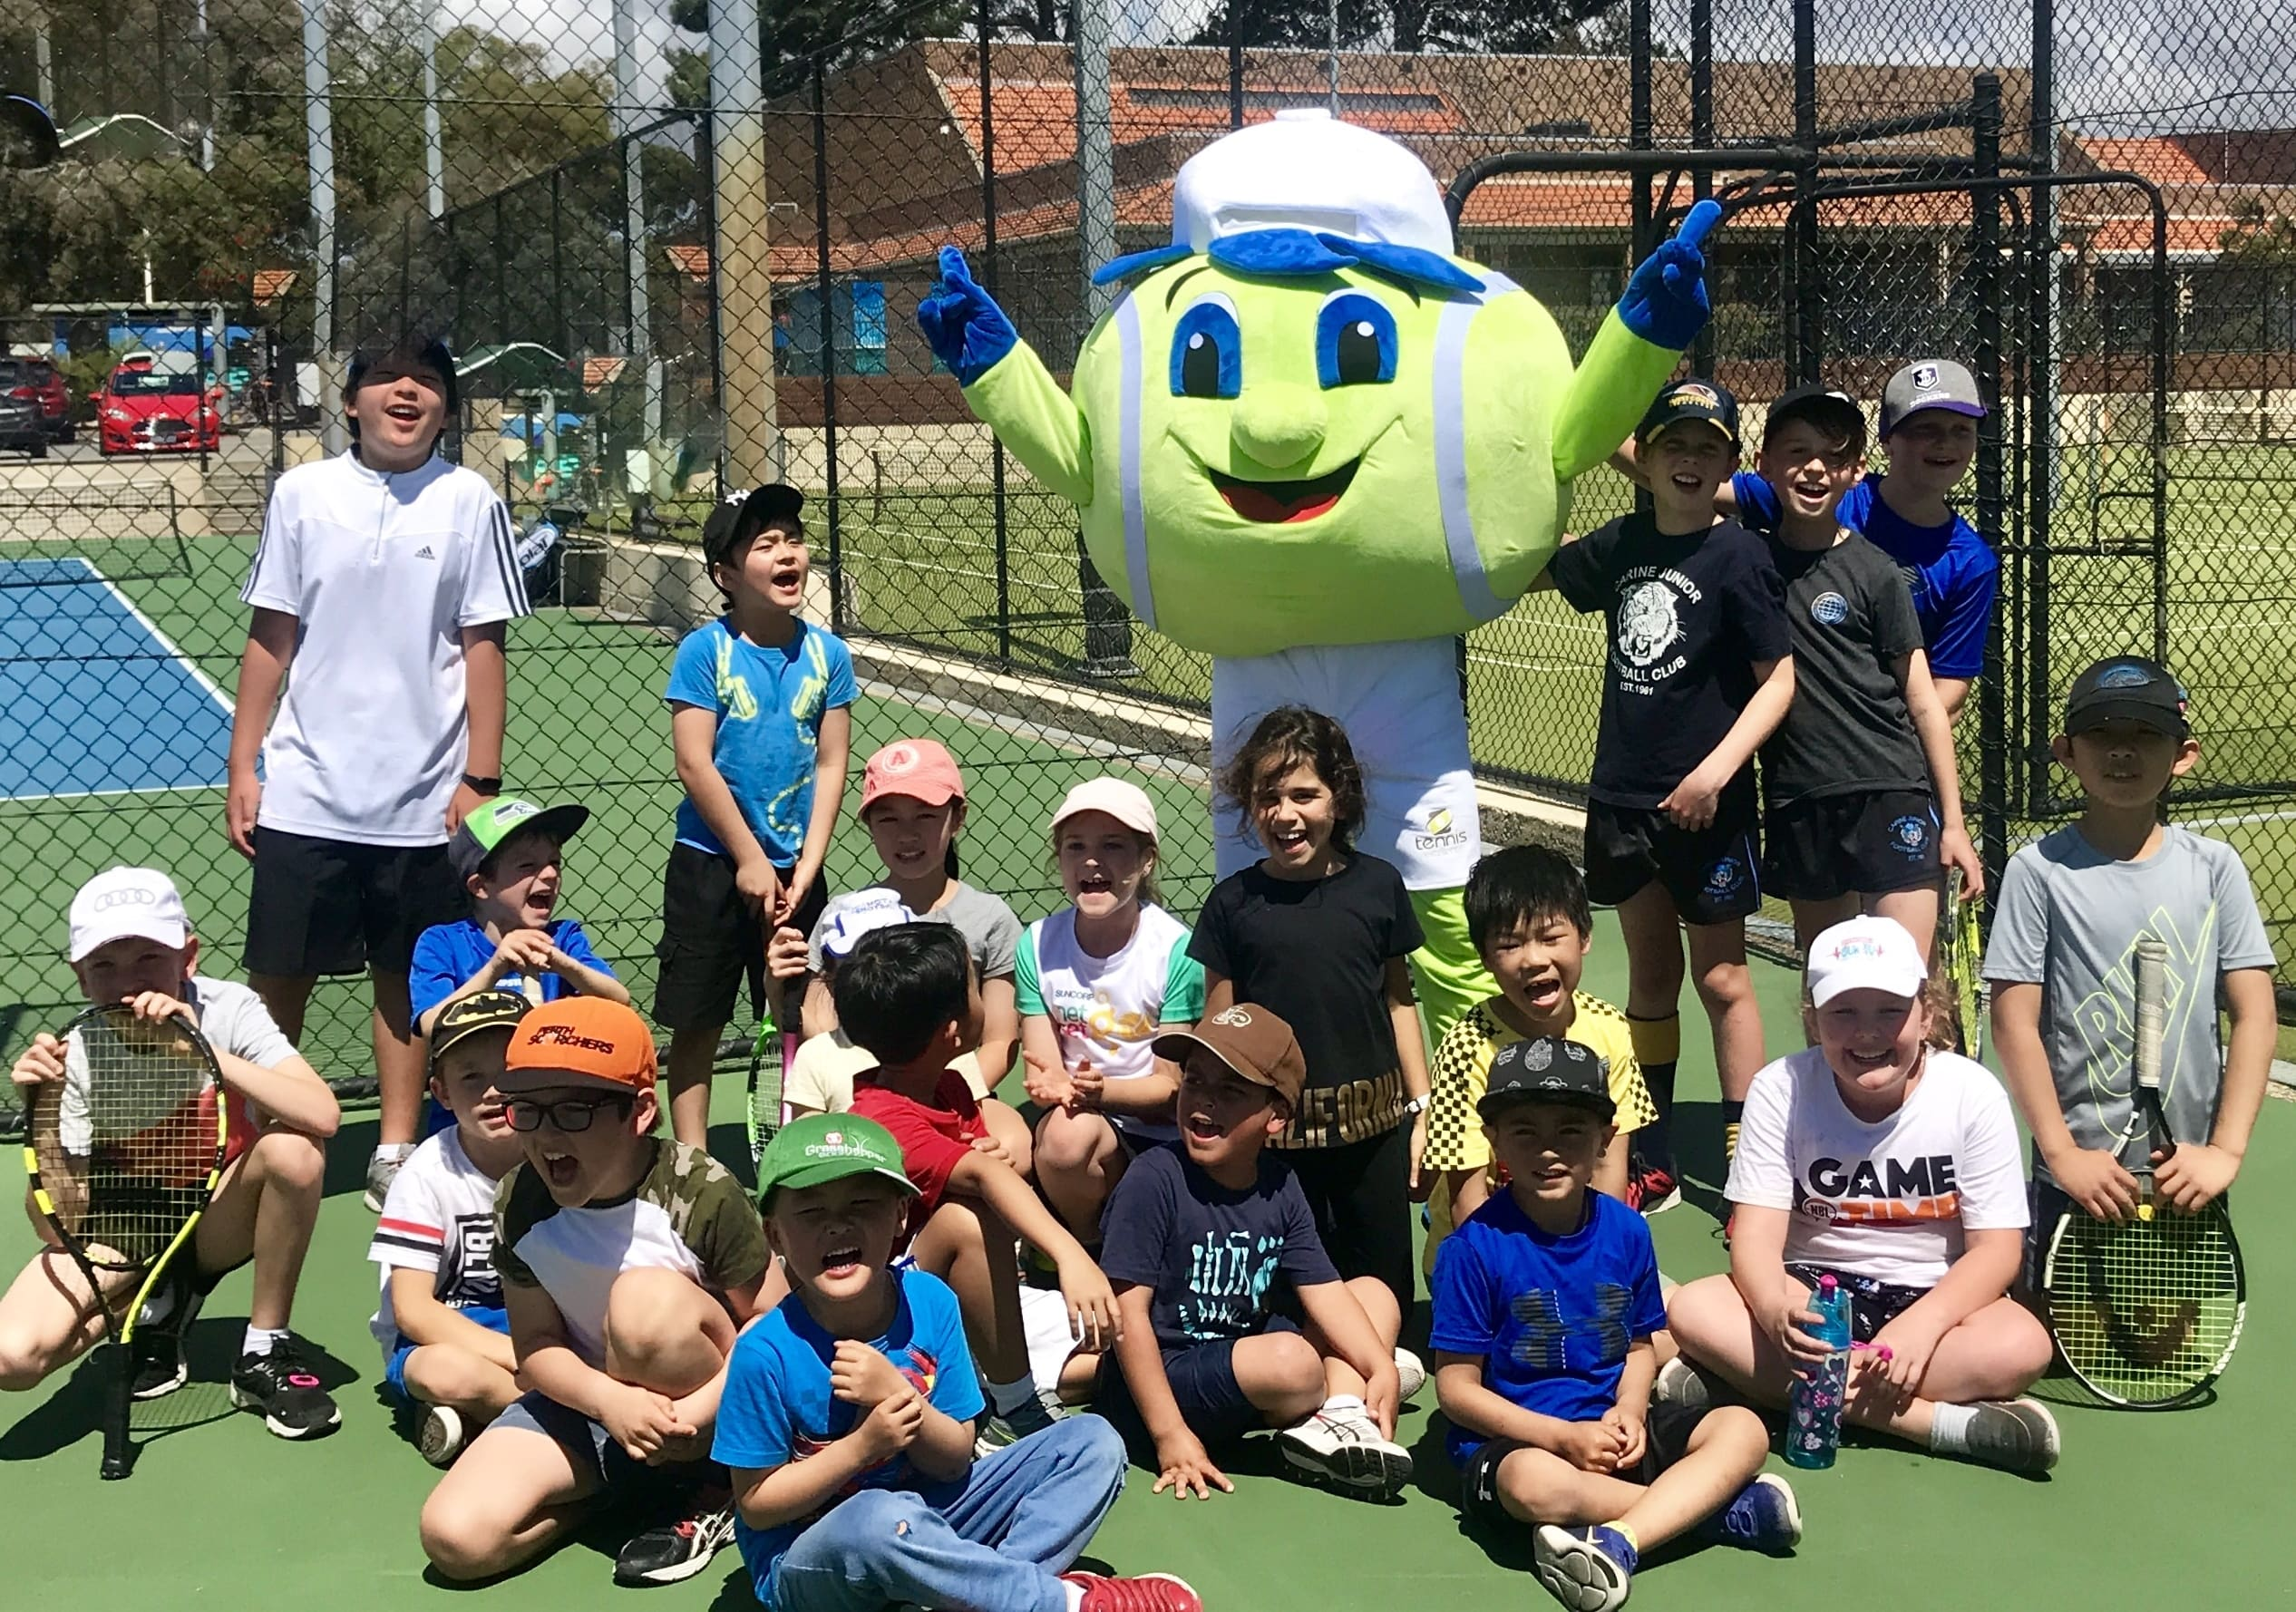 https://www.tennisexcellence.com.au/wp-content/uploads/2019/12/IMG_6933-Edited.jpg